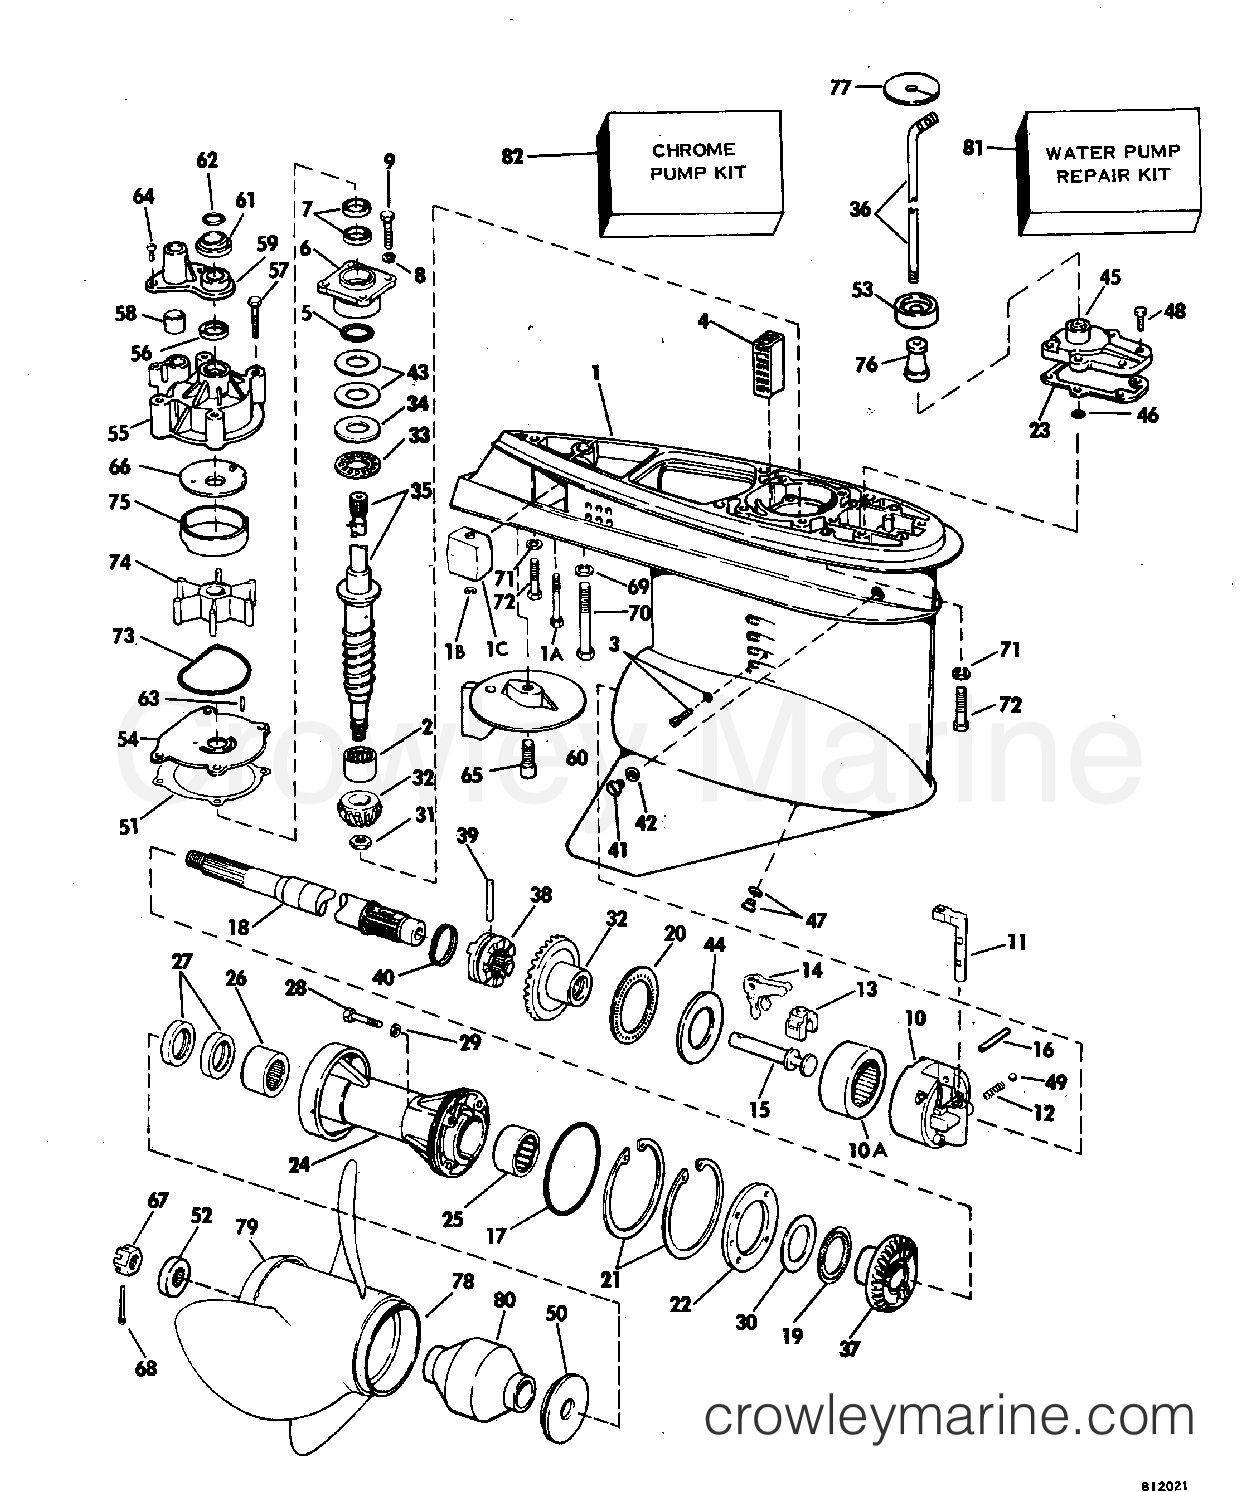 1981 Evinrude Outboards 150 - E150TRLCIA GEARCASE section